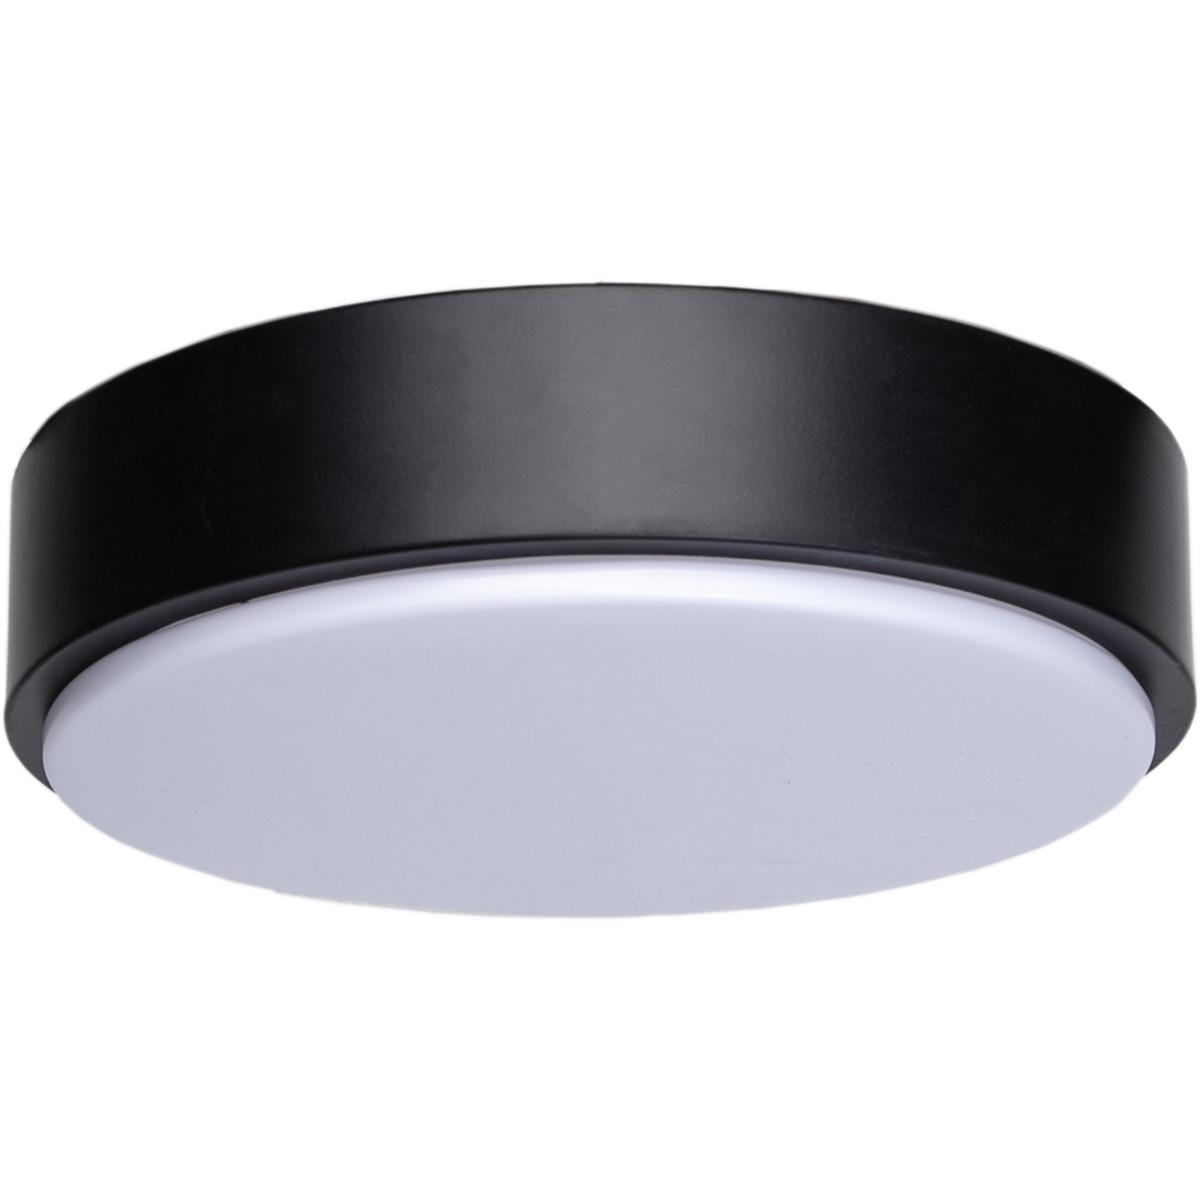 LED Plafondlamp - Aigi Santi - Opbouw Rond 12W - Warm Wit 3000K - Mat Zwart Aluminium